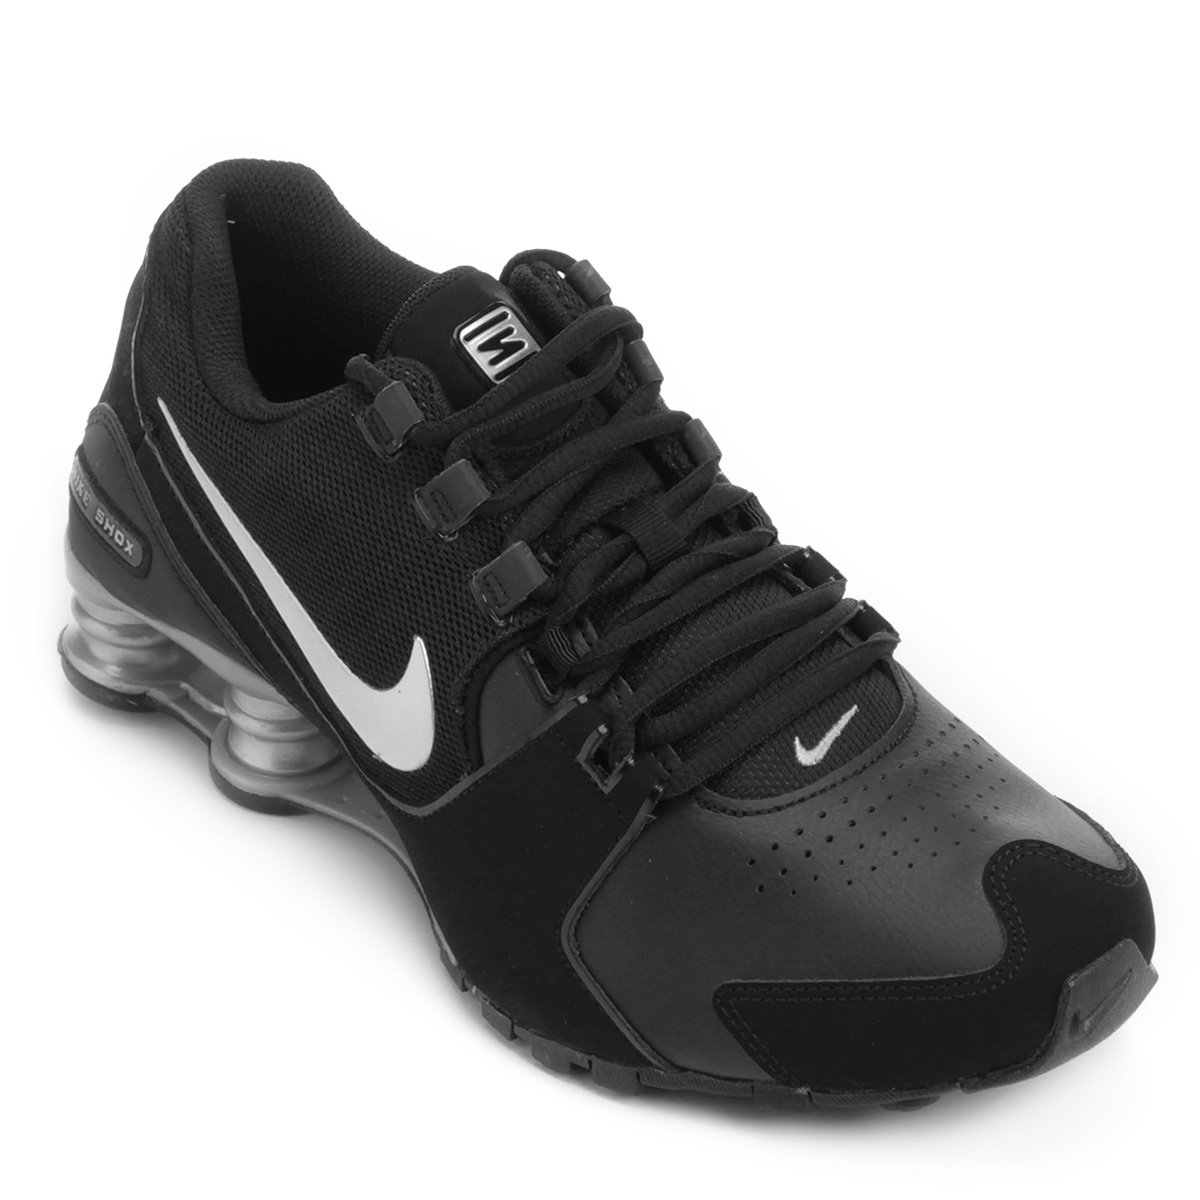 5946d4a6fd Tênis Couro Nike Shox Avenue LTR Masculino - Preto | Shop Timão